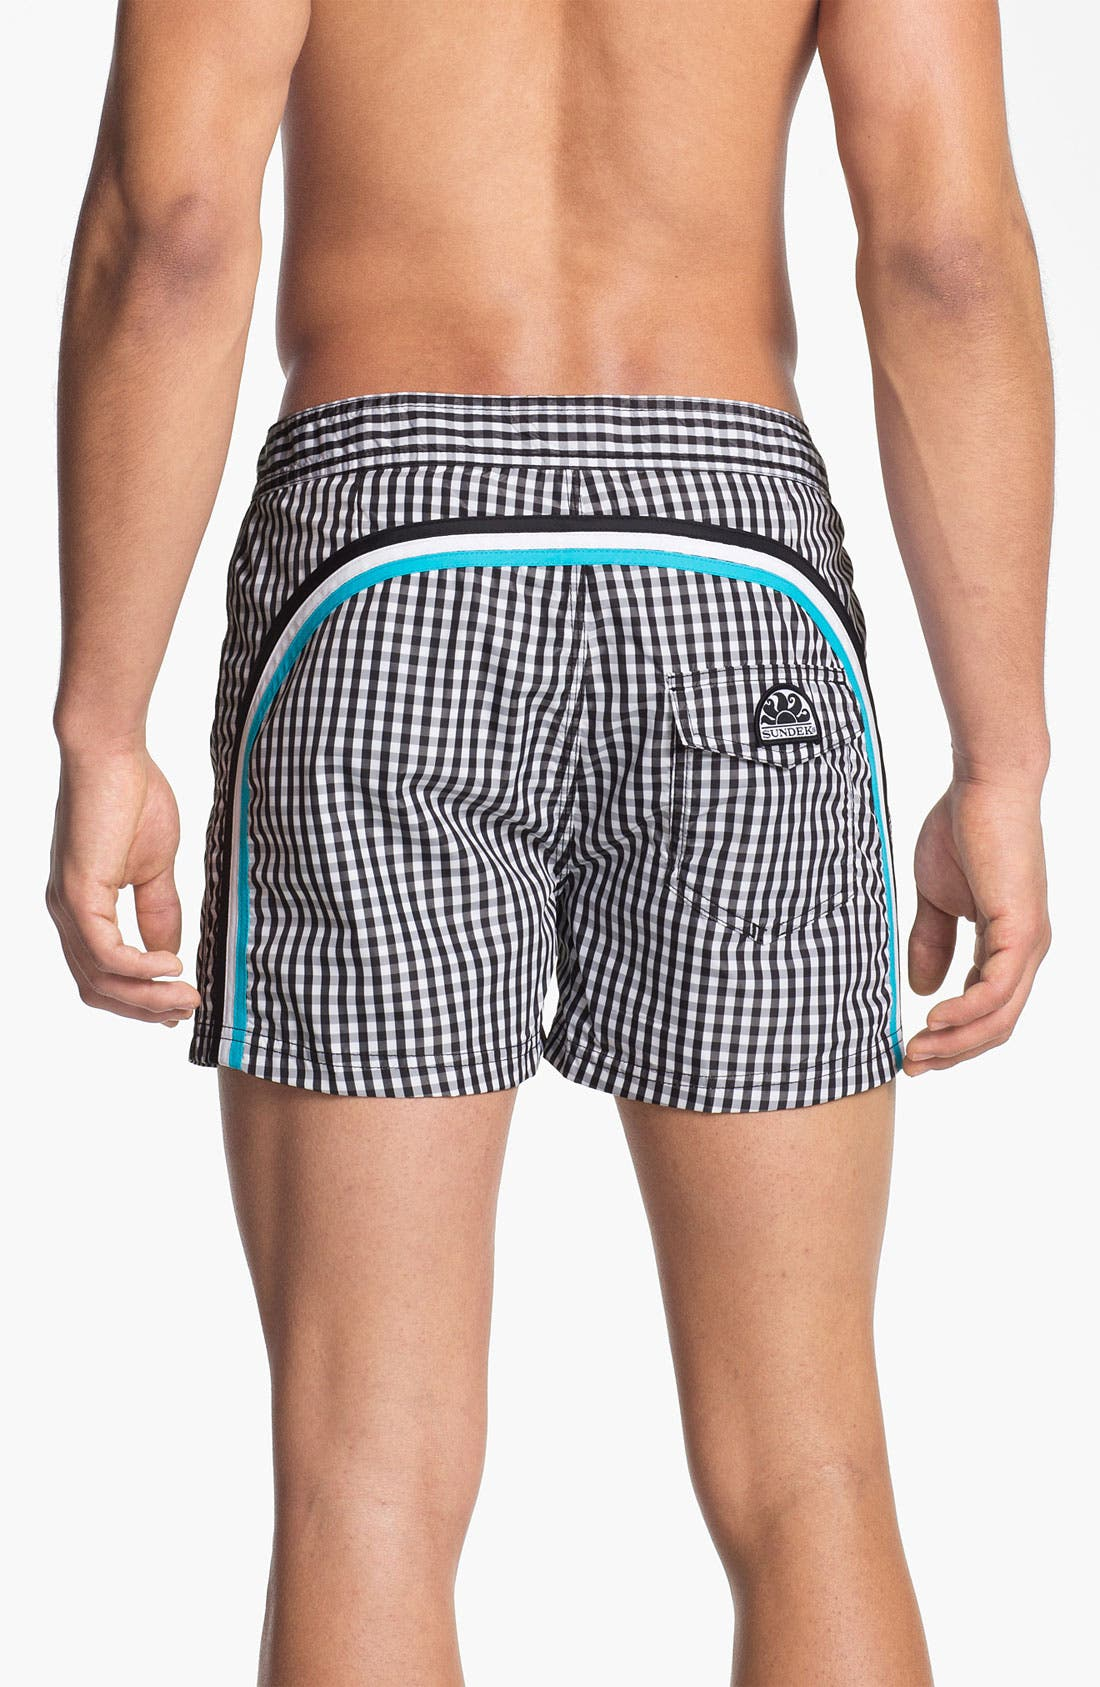 Alternate Image 1 Selected - Sundek 'Vichy' Board Shorts